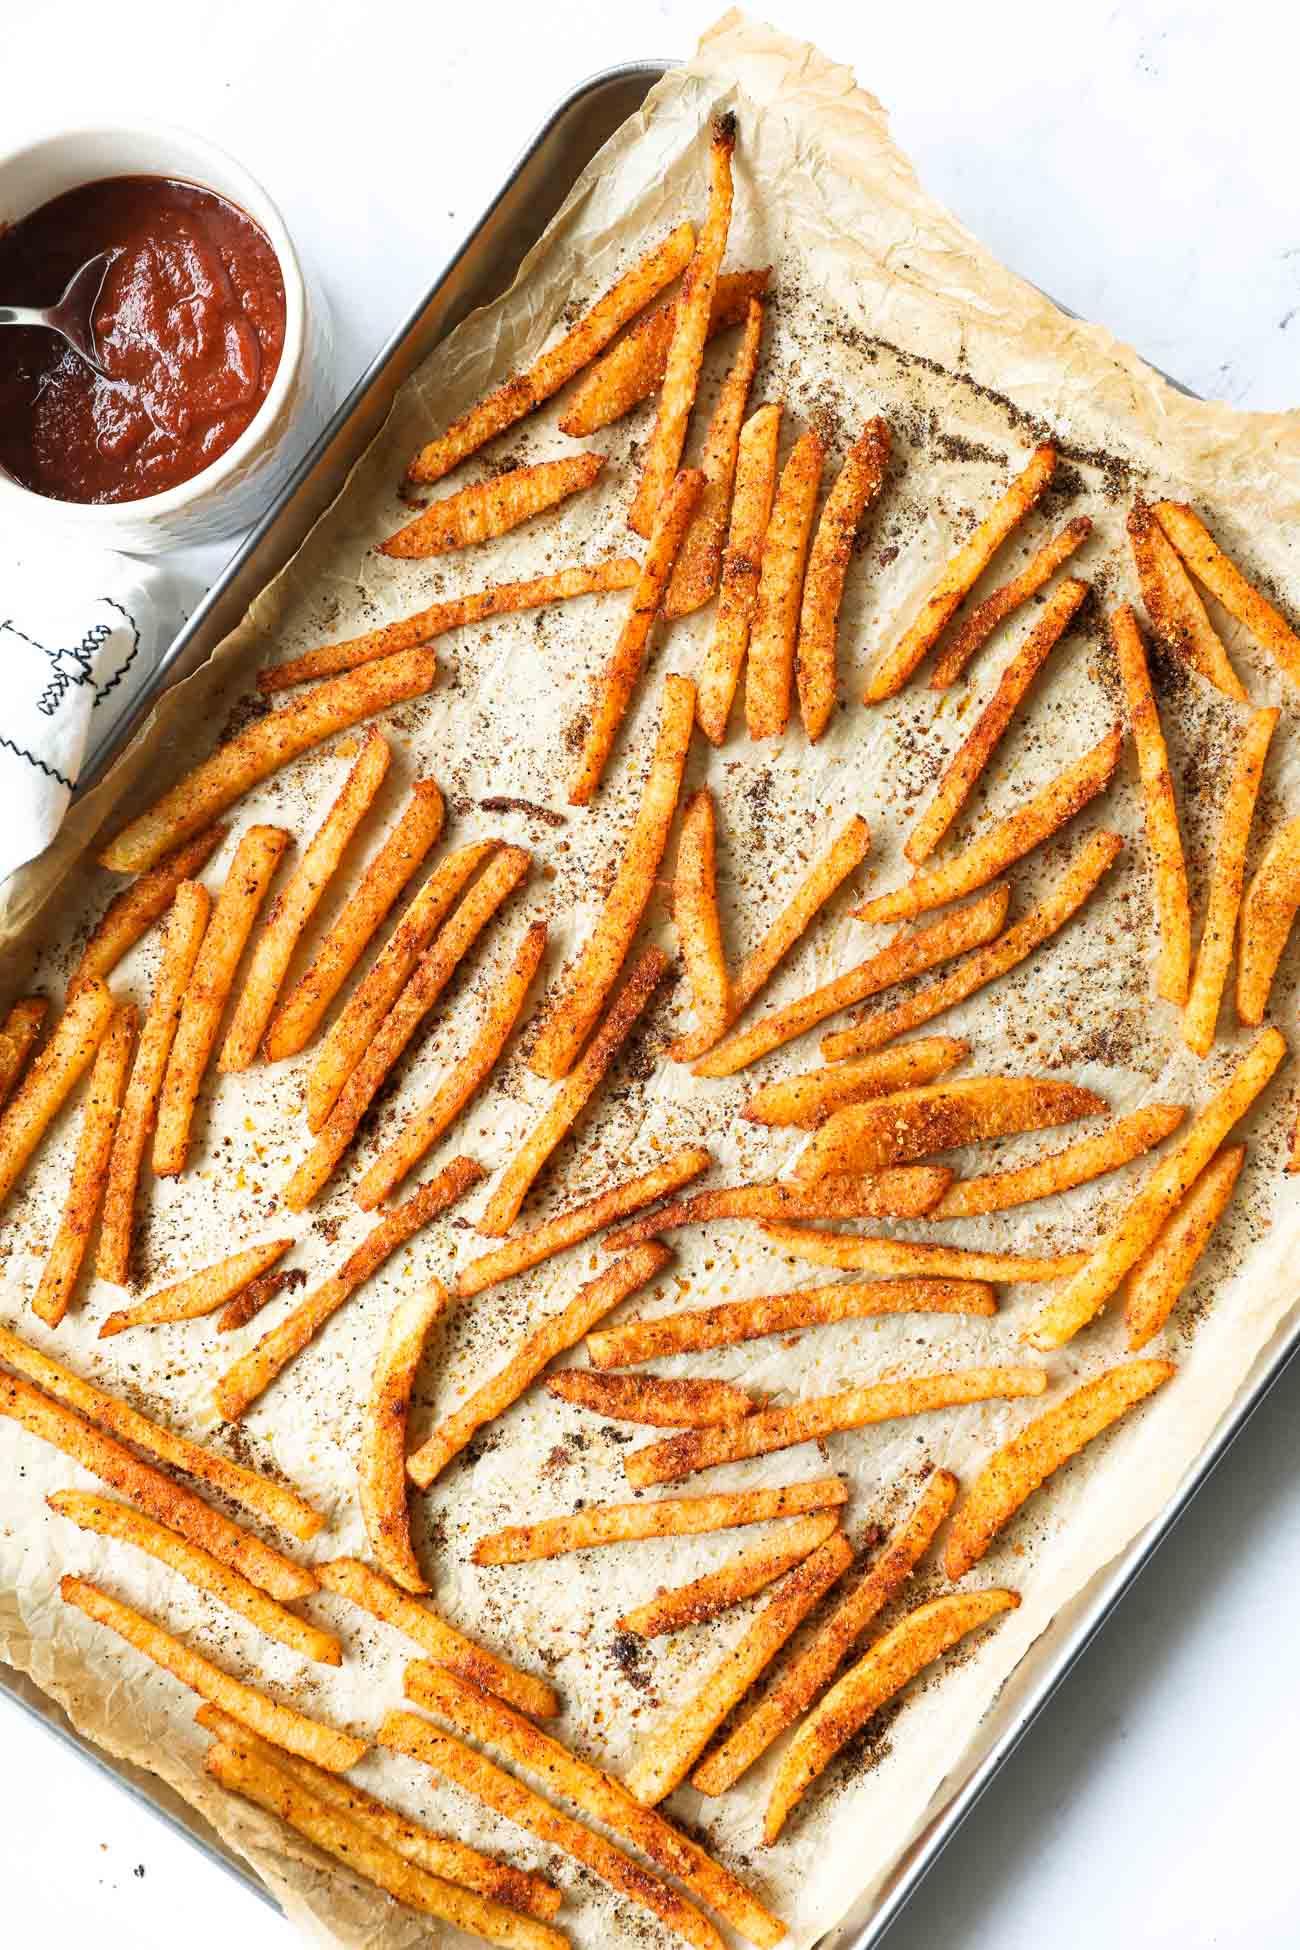 Seasoned crispy jicama fries on a sheet pan with ketchup on the side